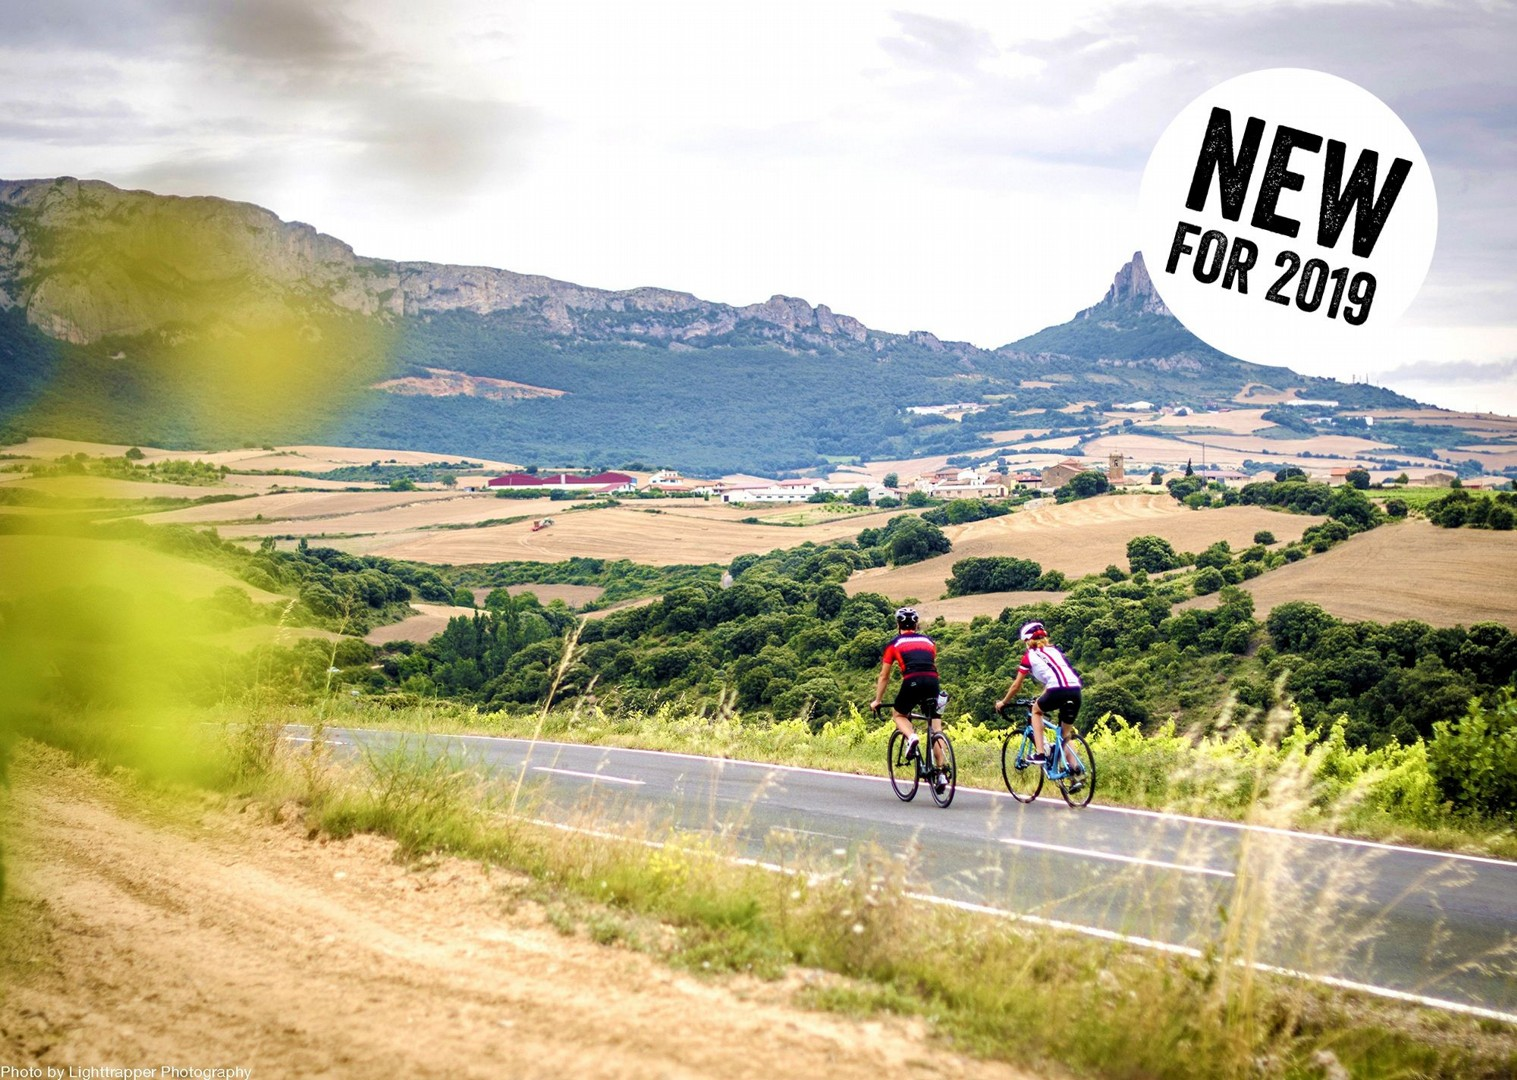 road-cycling-holiday-spain-skedaddle-new-2019.jpg - Northern Spain - La Rioja - Ruta del Vino - Self-Guided Road Cycling Holiday - Road Cycling